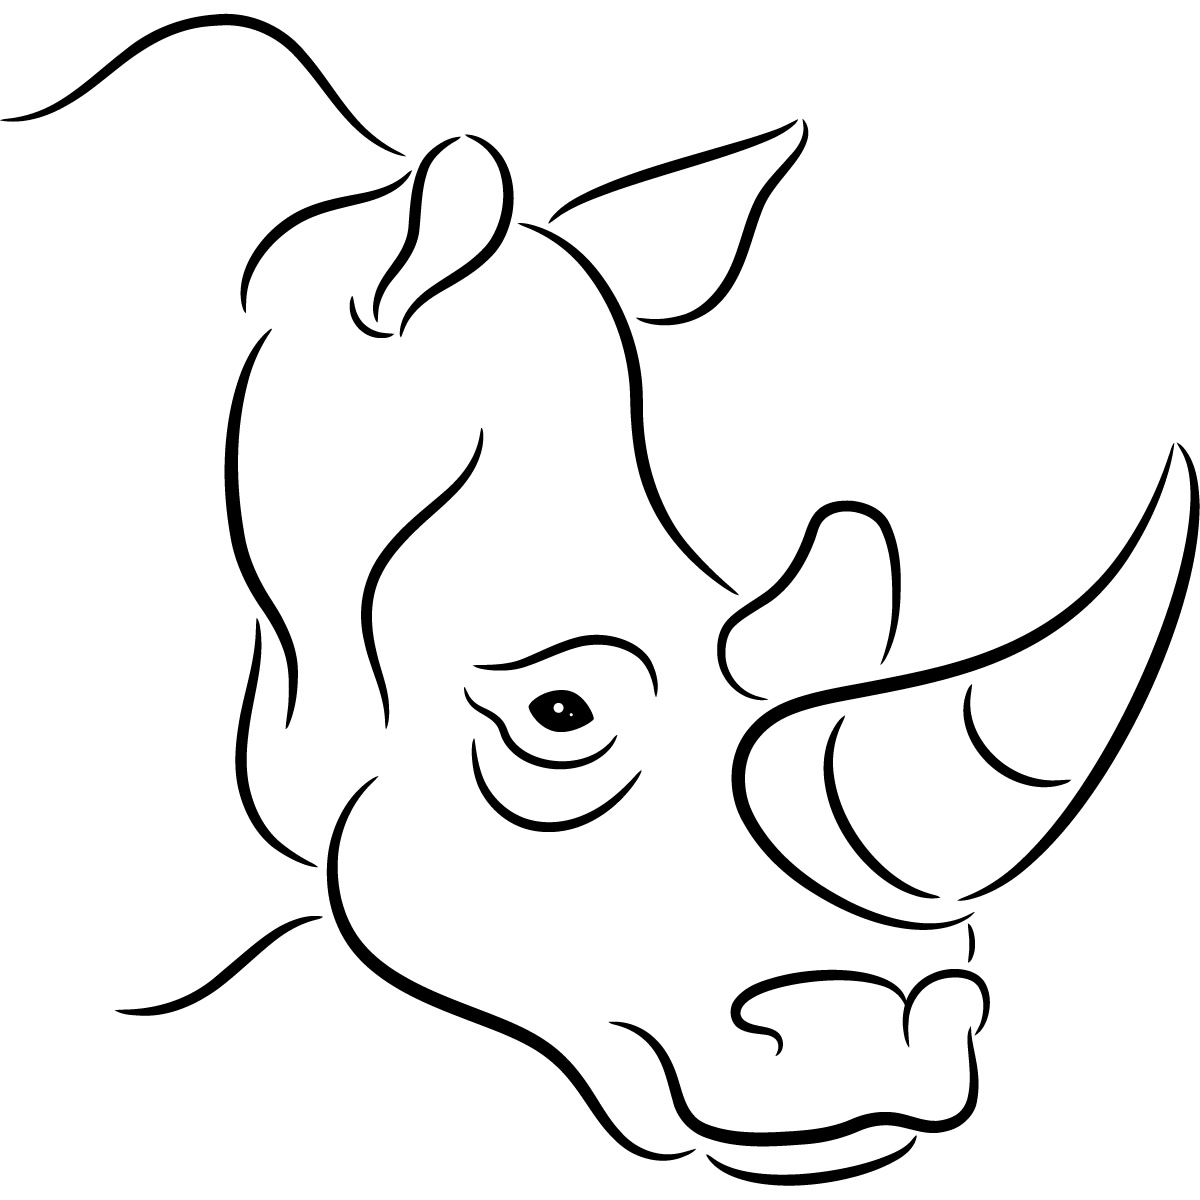 Head Rhinoceros Outline Wild Animals Wall Art Stickers